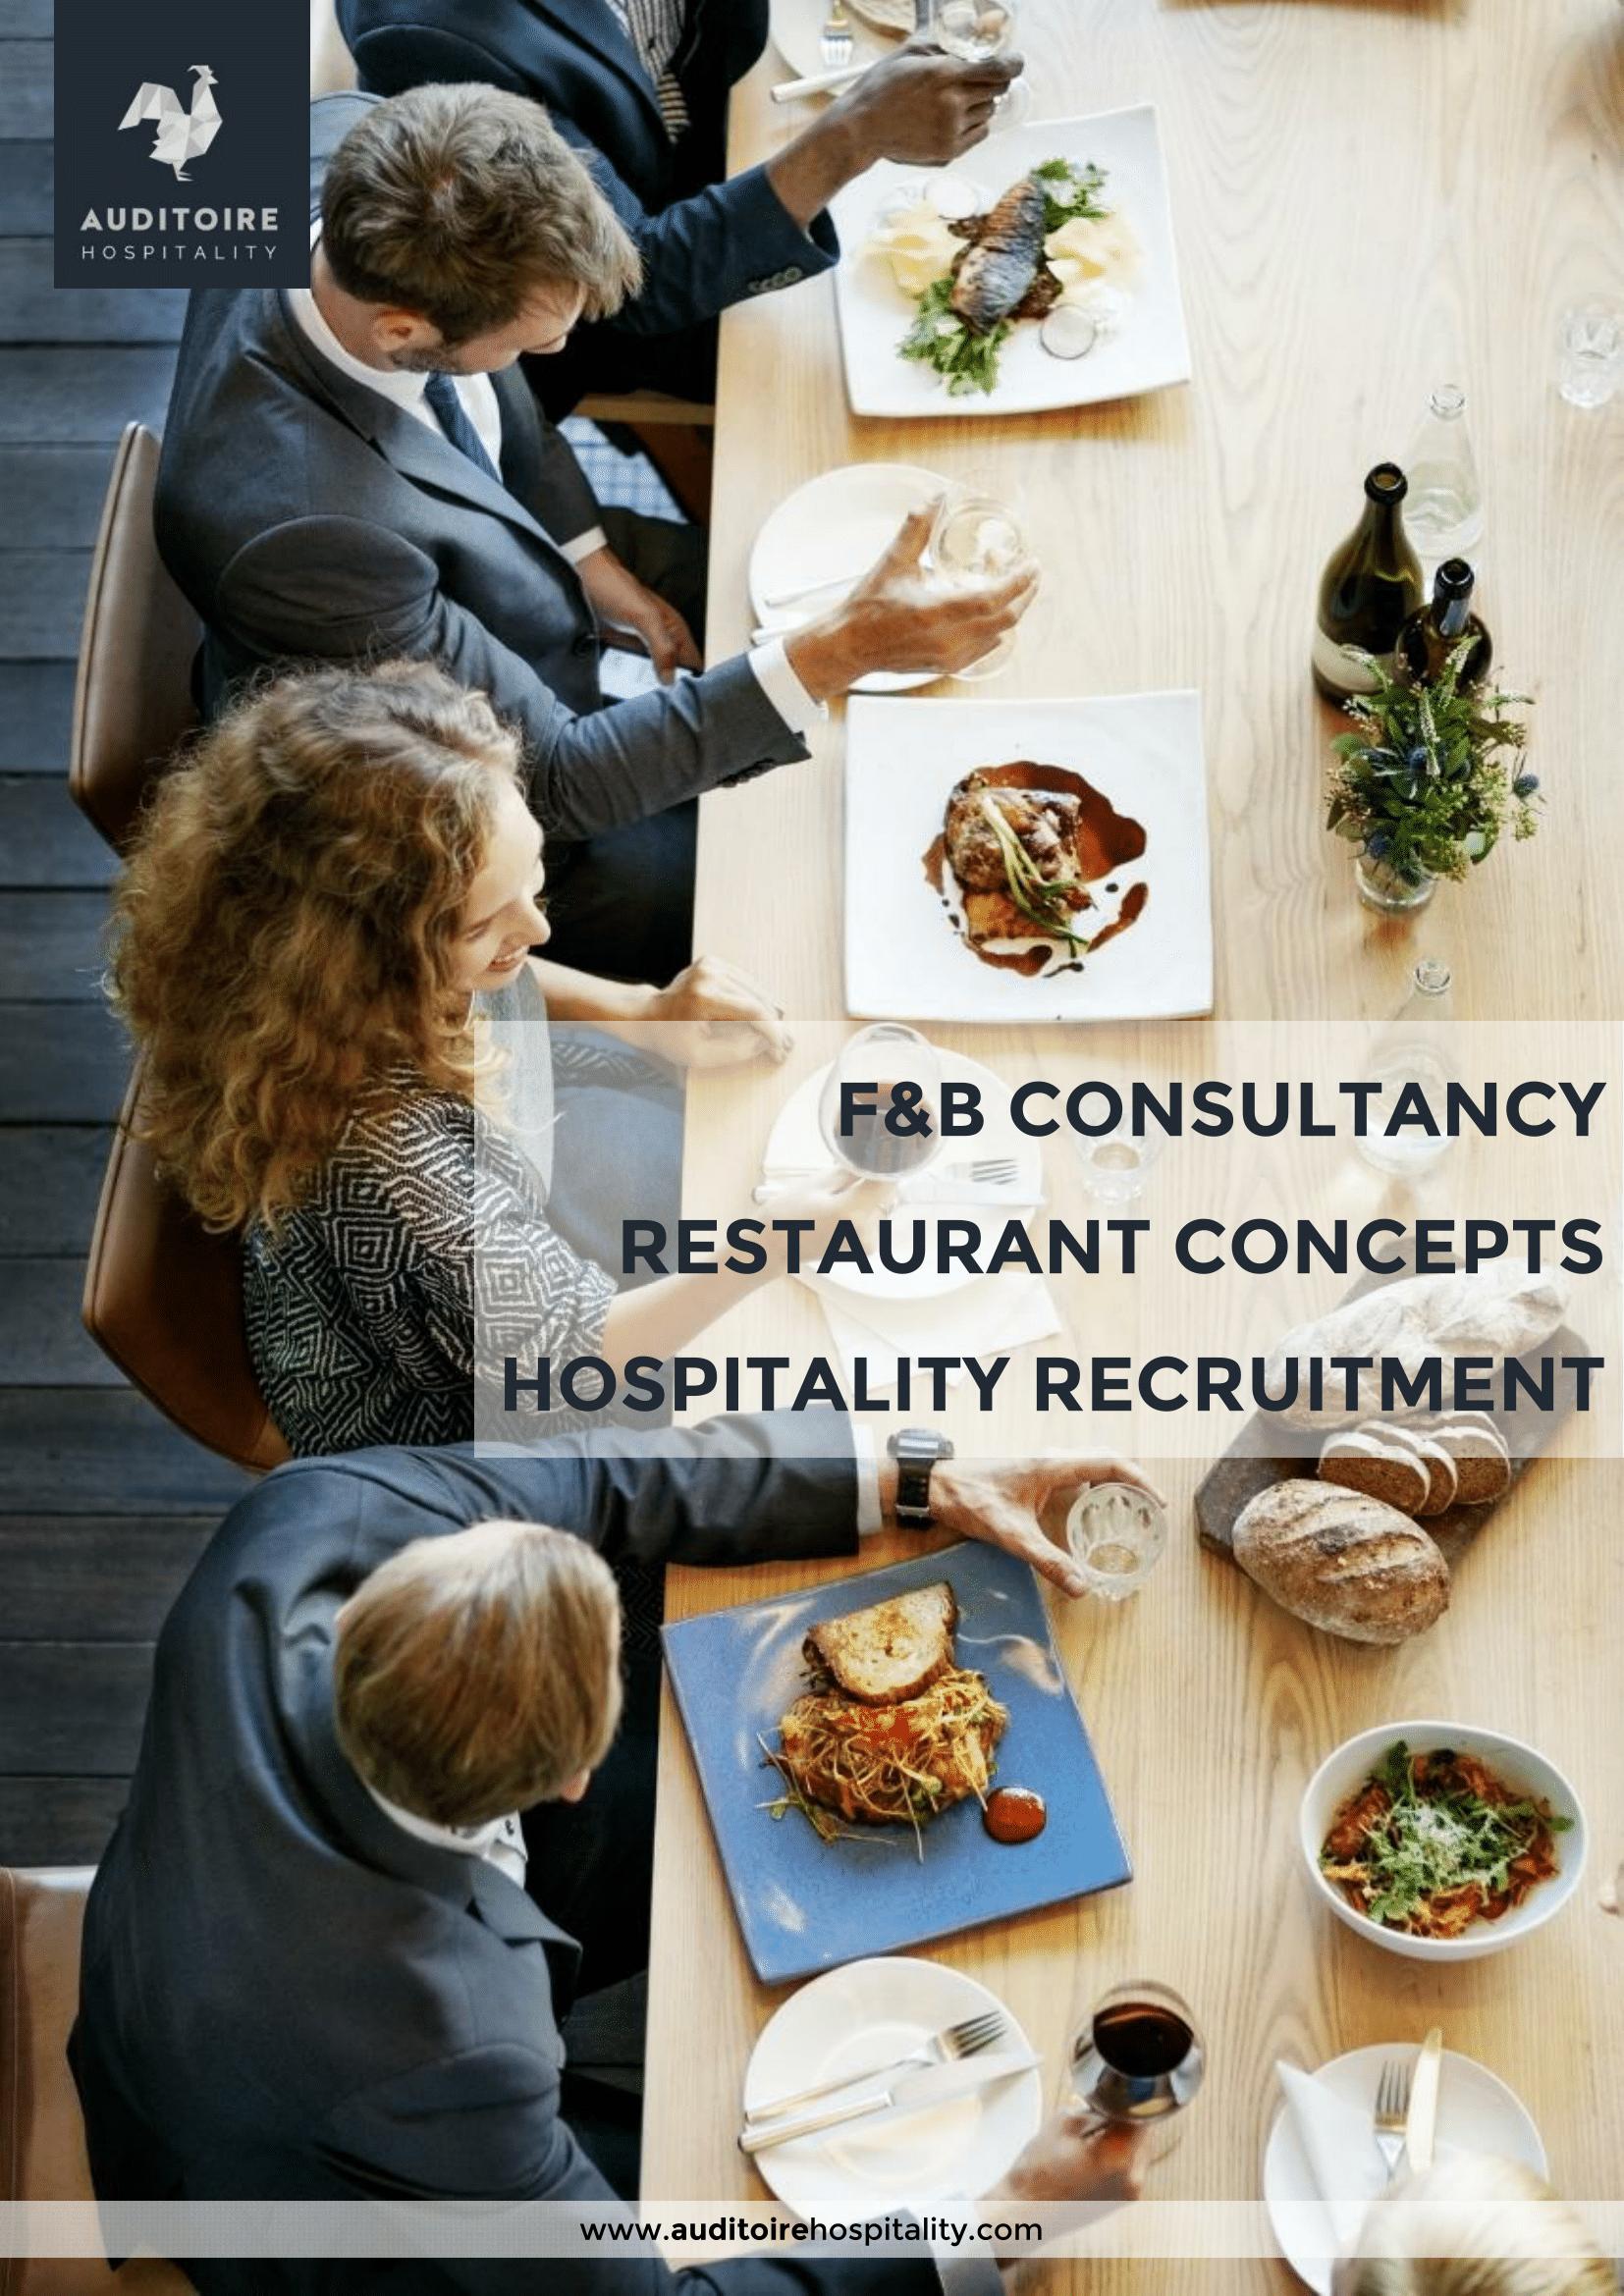 auditoire hospitality company profile 2018